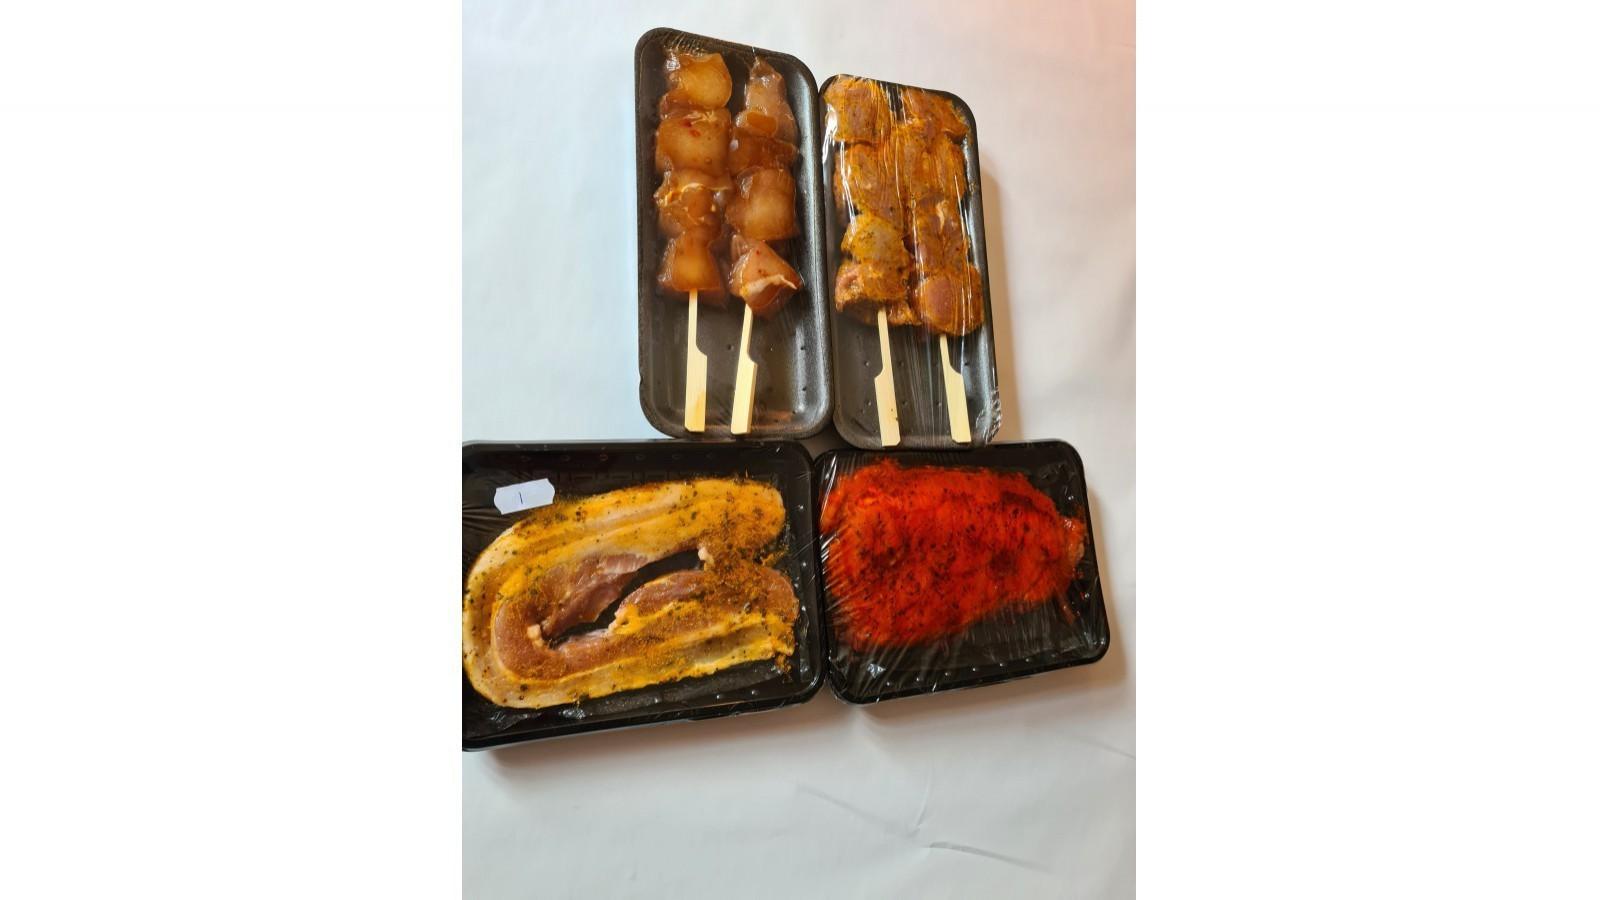 Deluxe barbecue box